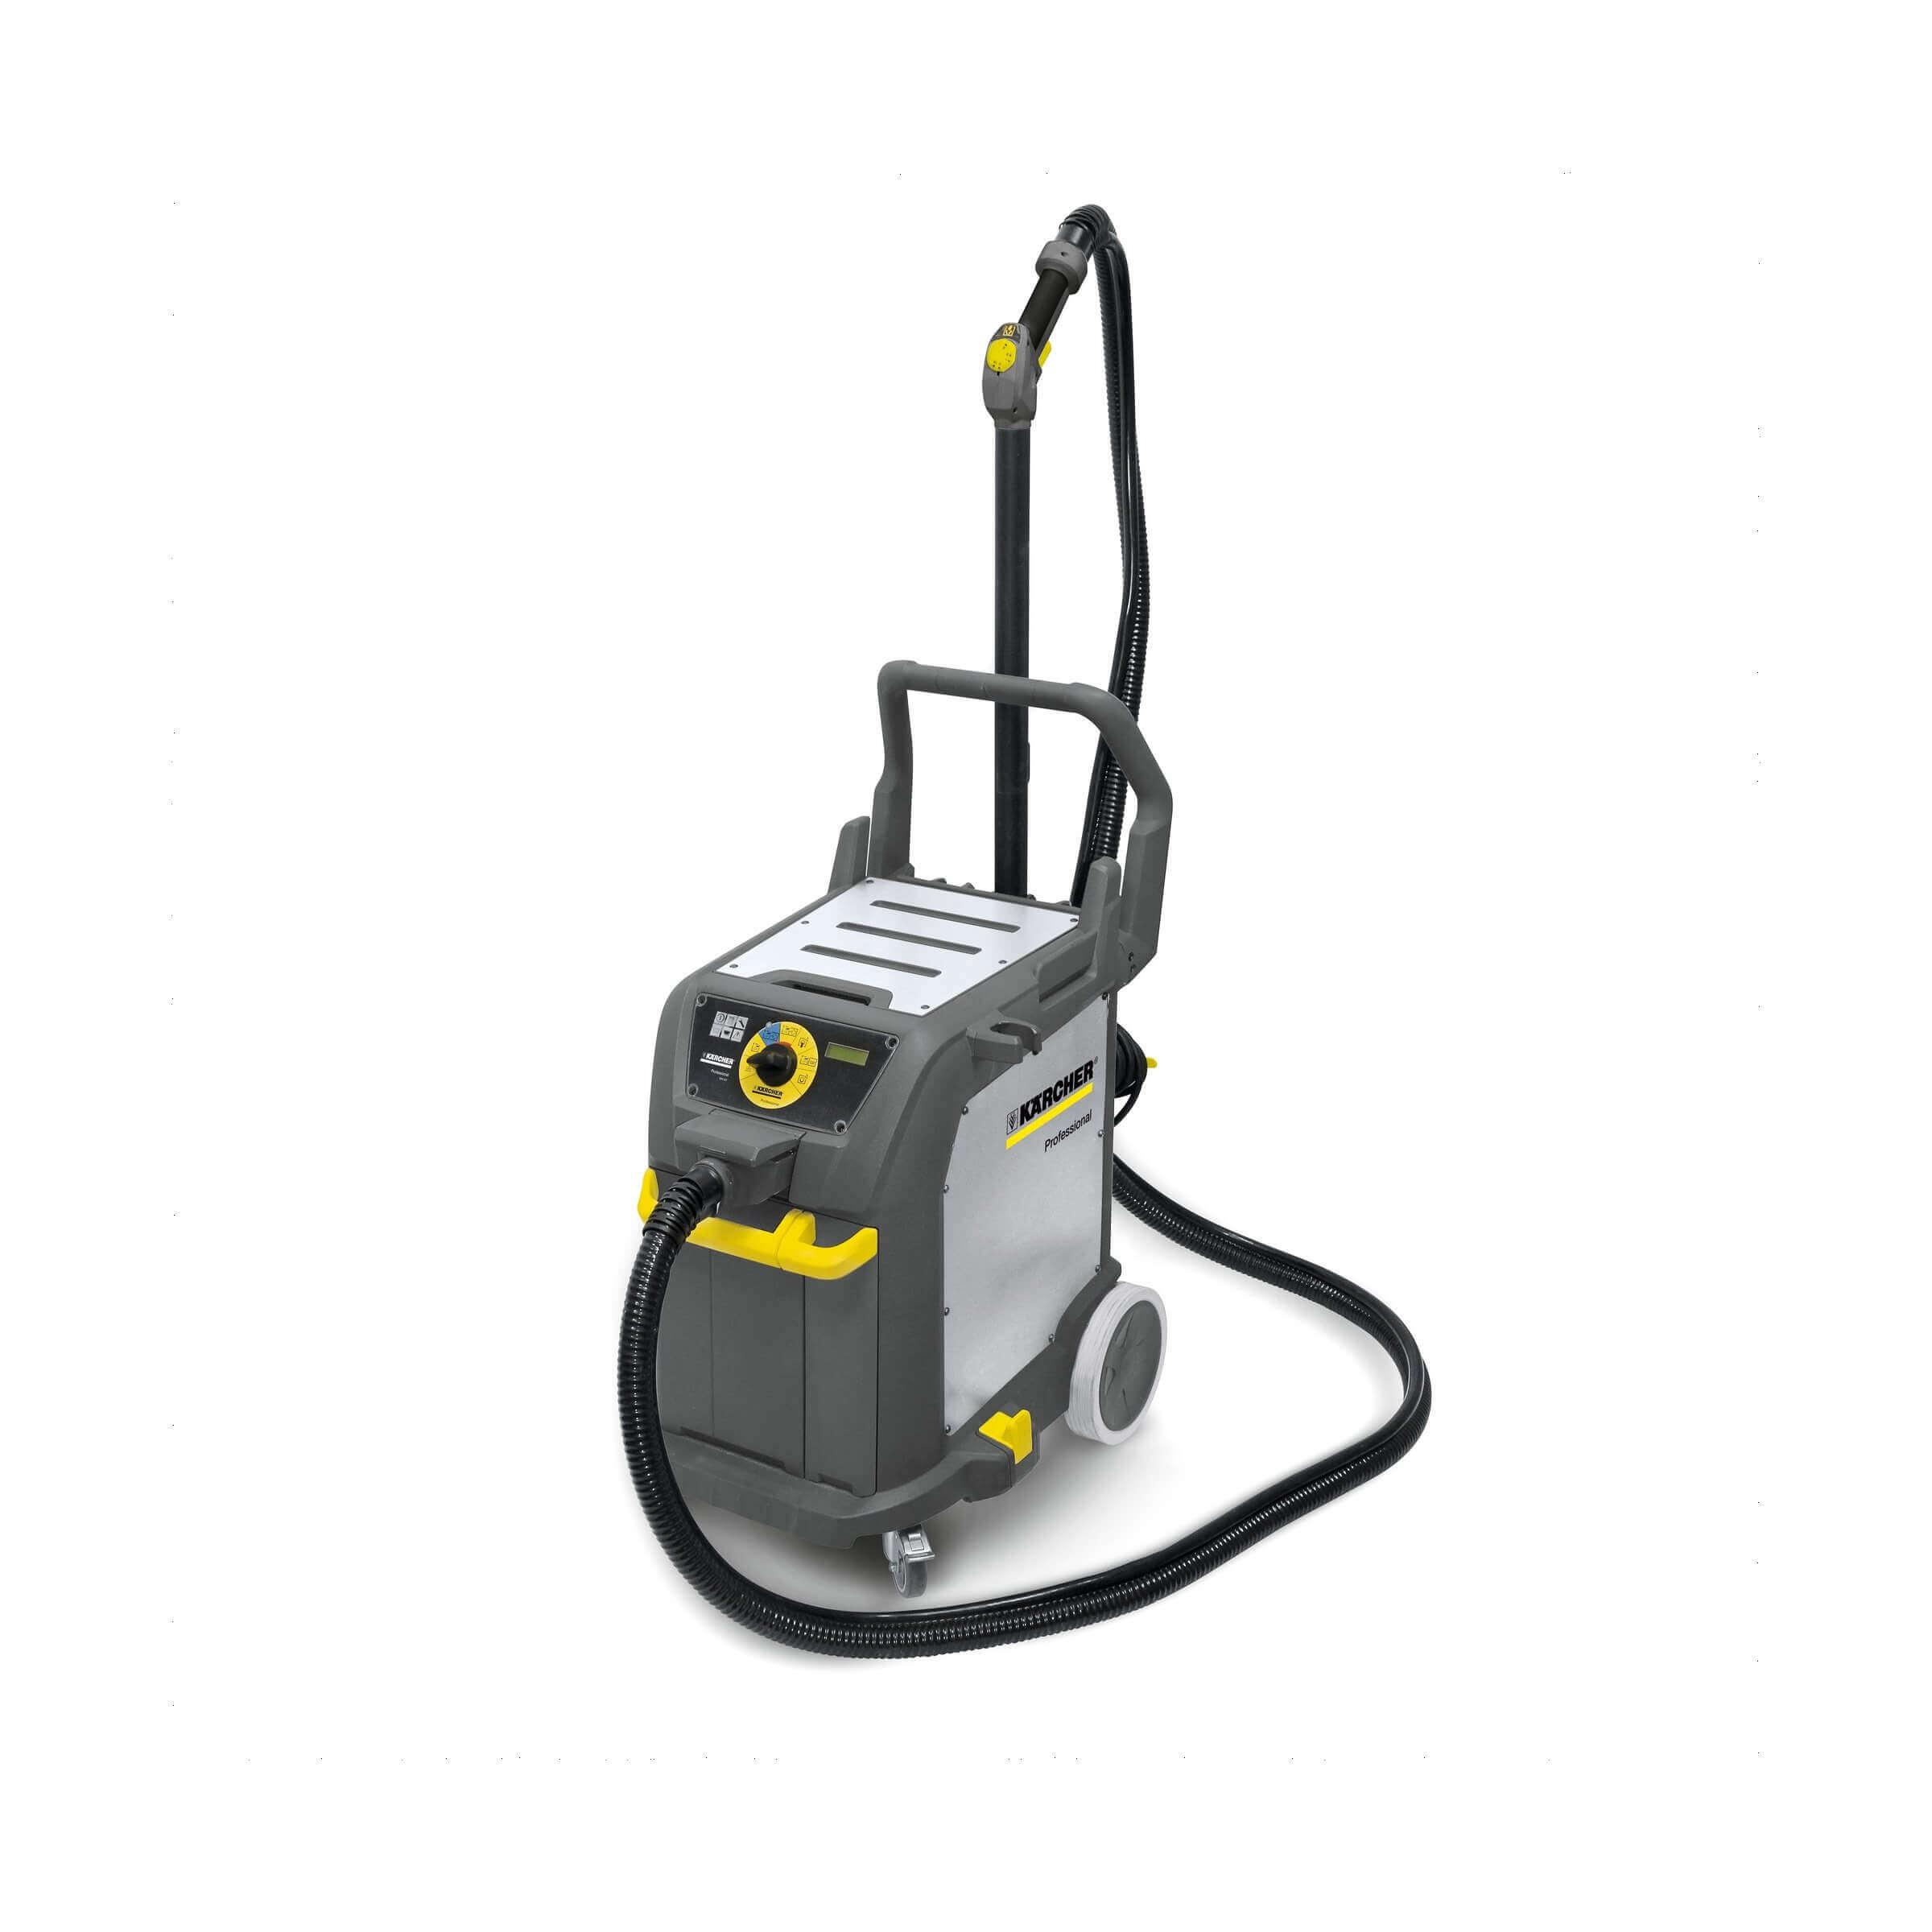 Kärcher SGV 8/5 dampstøvsuger, 8 bar